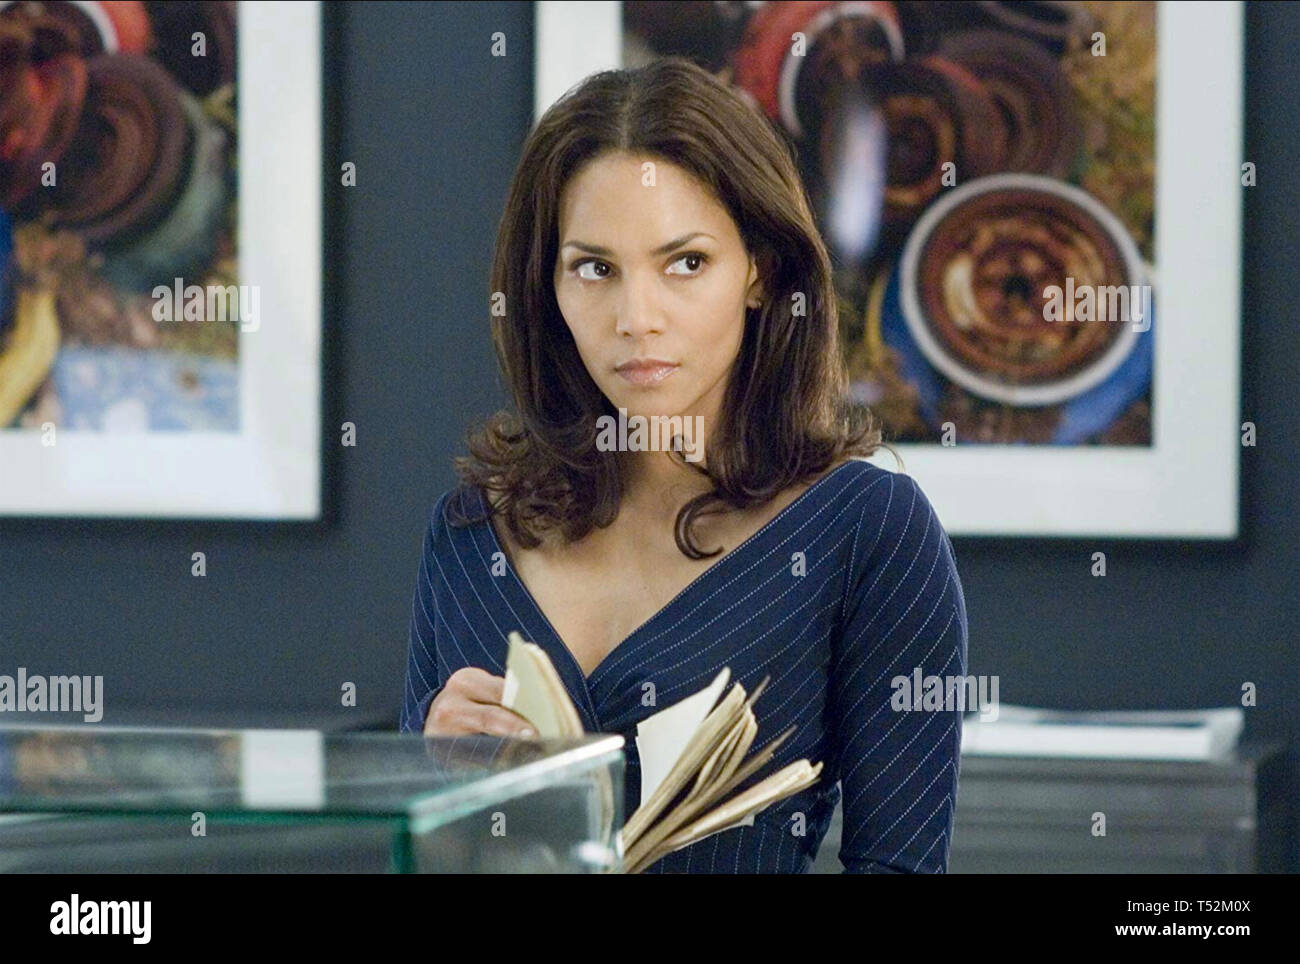 PERFECT STRANGER 2007 Revolution Studios film with Halle Berry - Stock Image